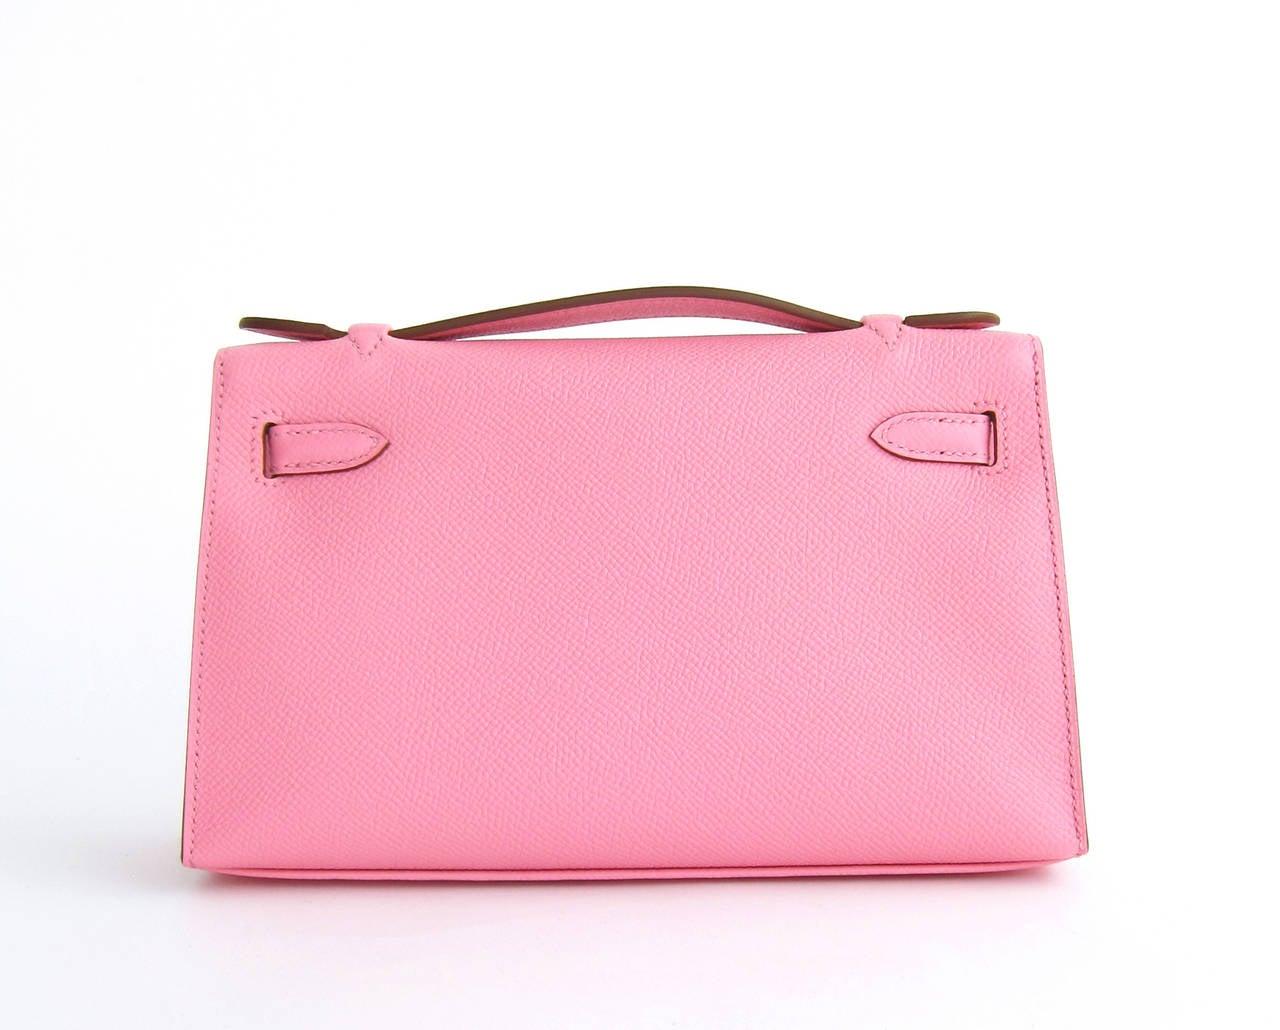 Hermes Rose Confetti Epsom Kelly Pochette Pink Clutch Bag Love 3